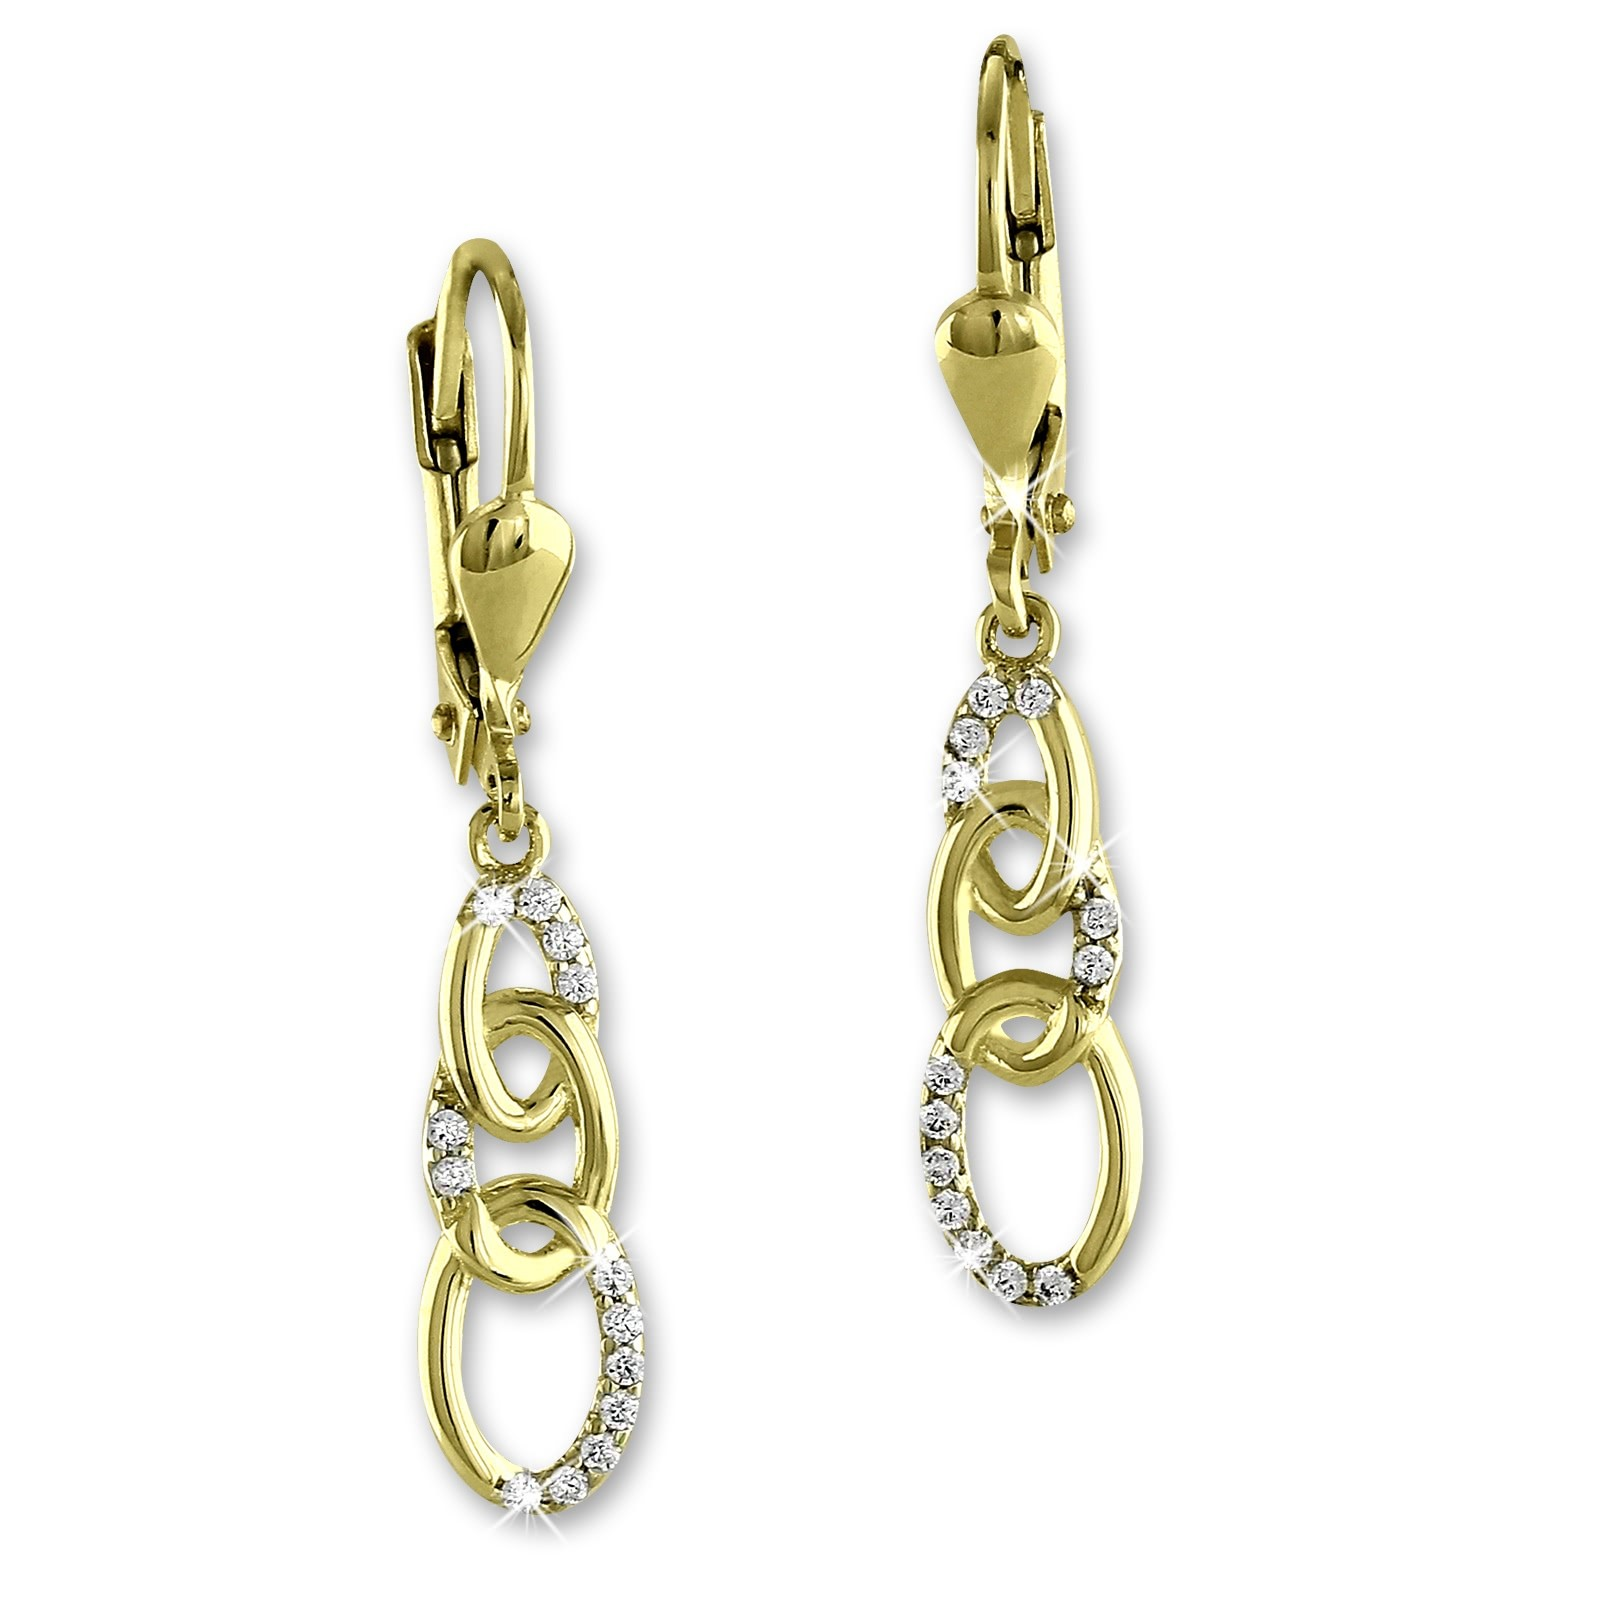 SilberDream Ohrhänger Kette Zirkonia Ohrring 333 Gold Echtschmuck GDO546WY